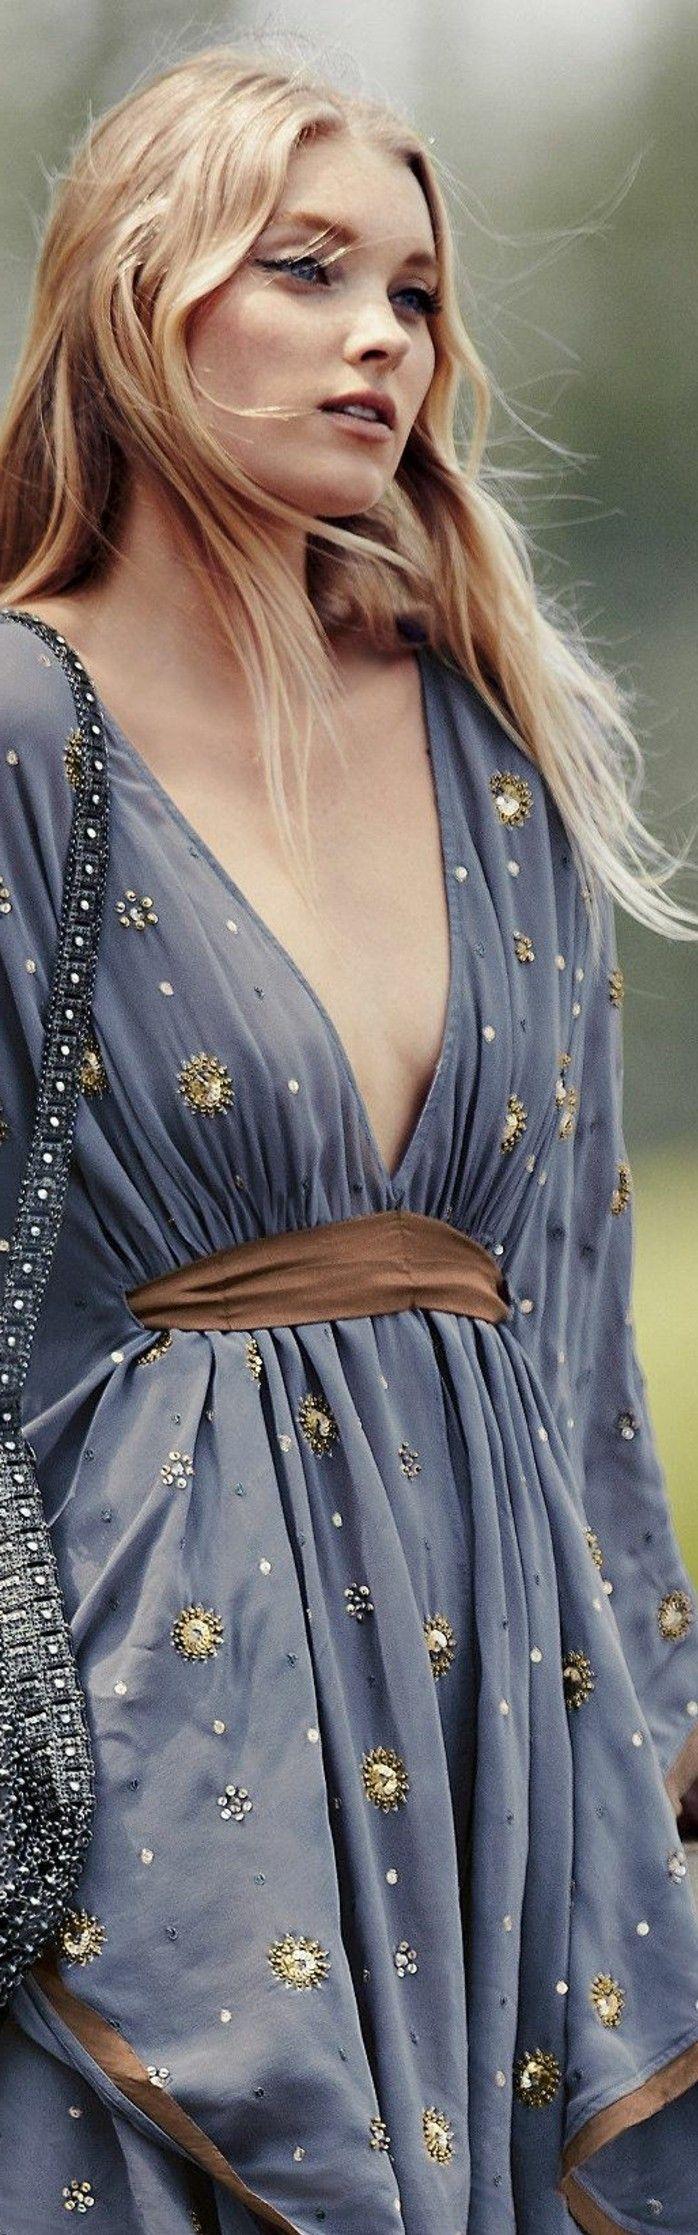 tenue boheme chic, robe longue bleue